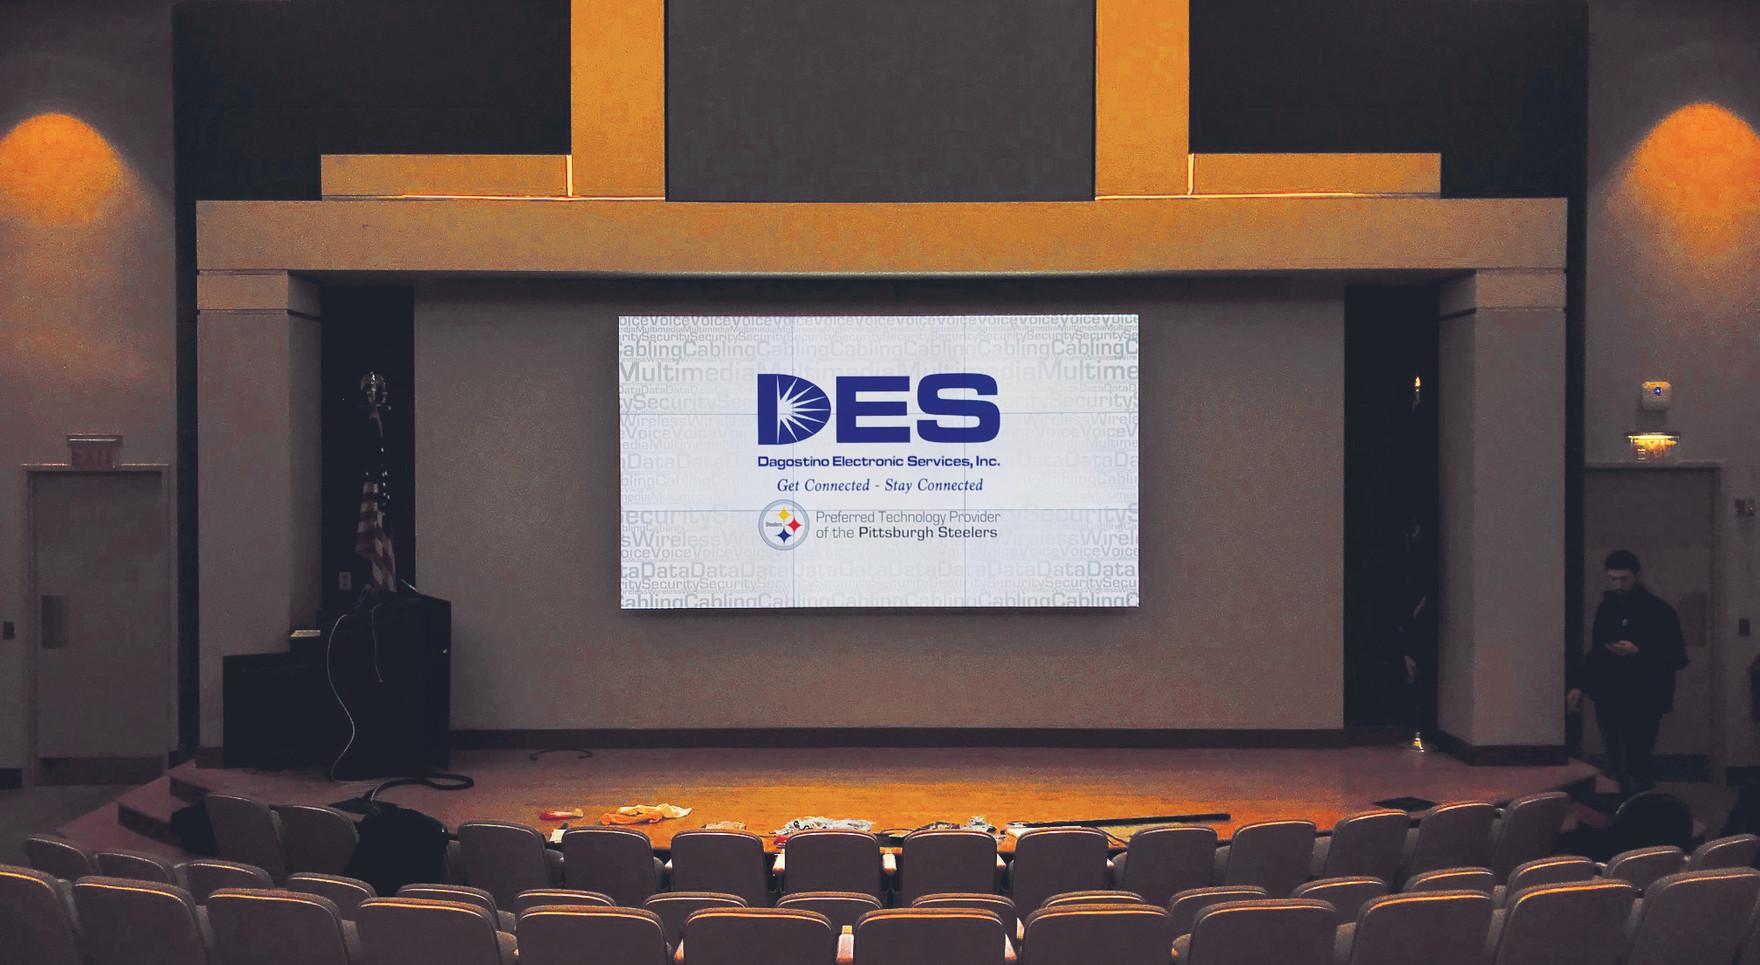 Auditorium: Allegheny General Hospital